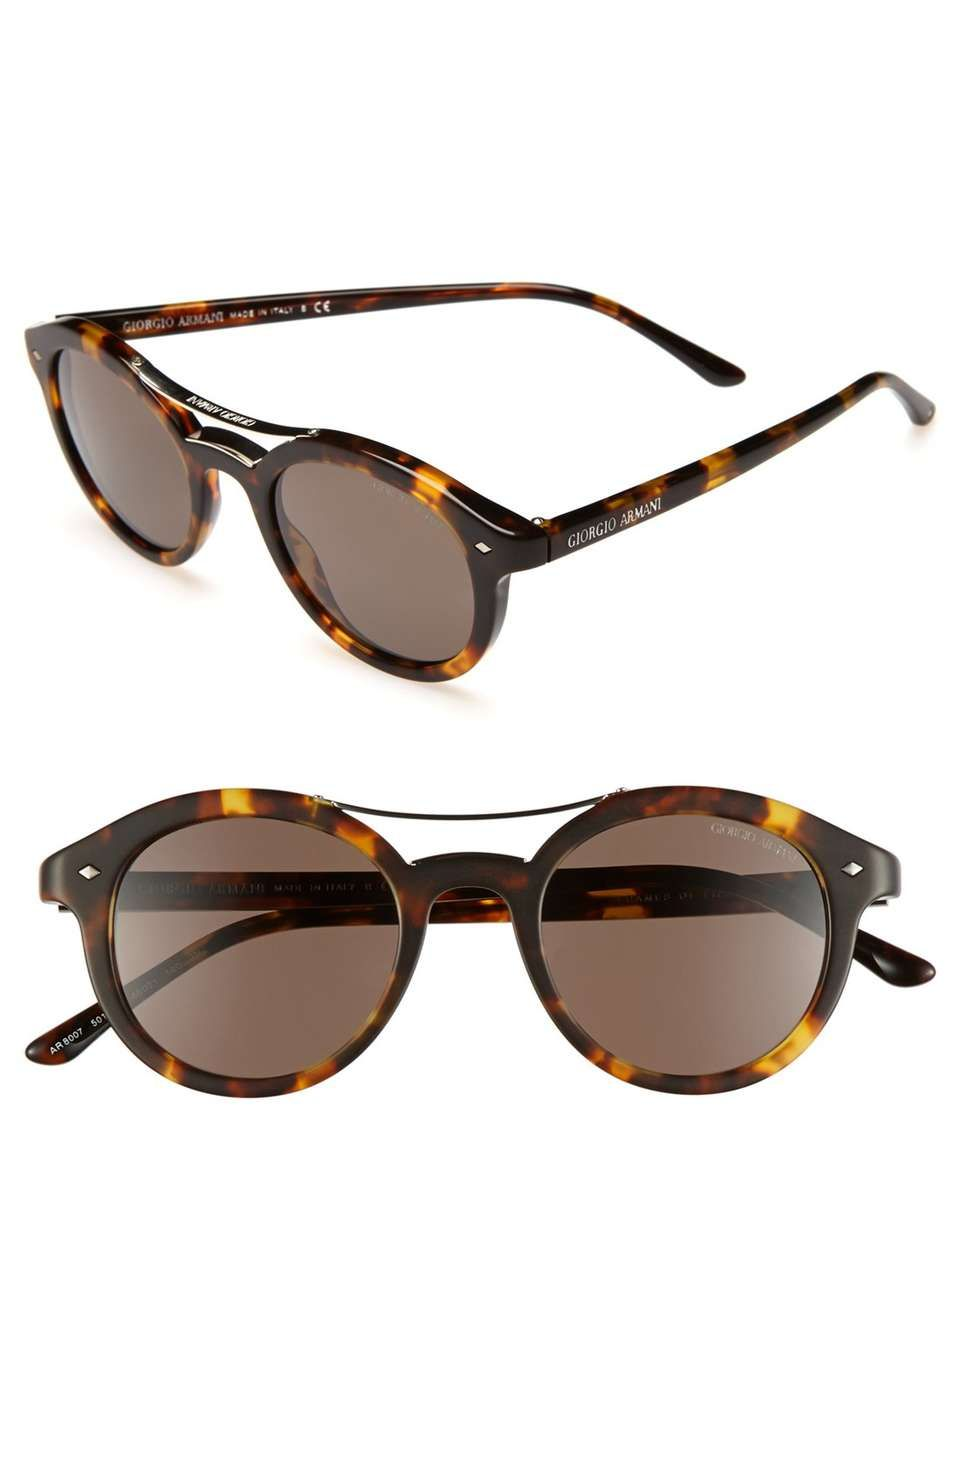 9381294e38f Giorgio Armani 46mm Sunglasses Armani Glasses